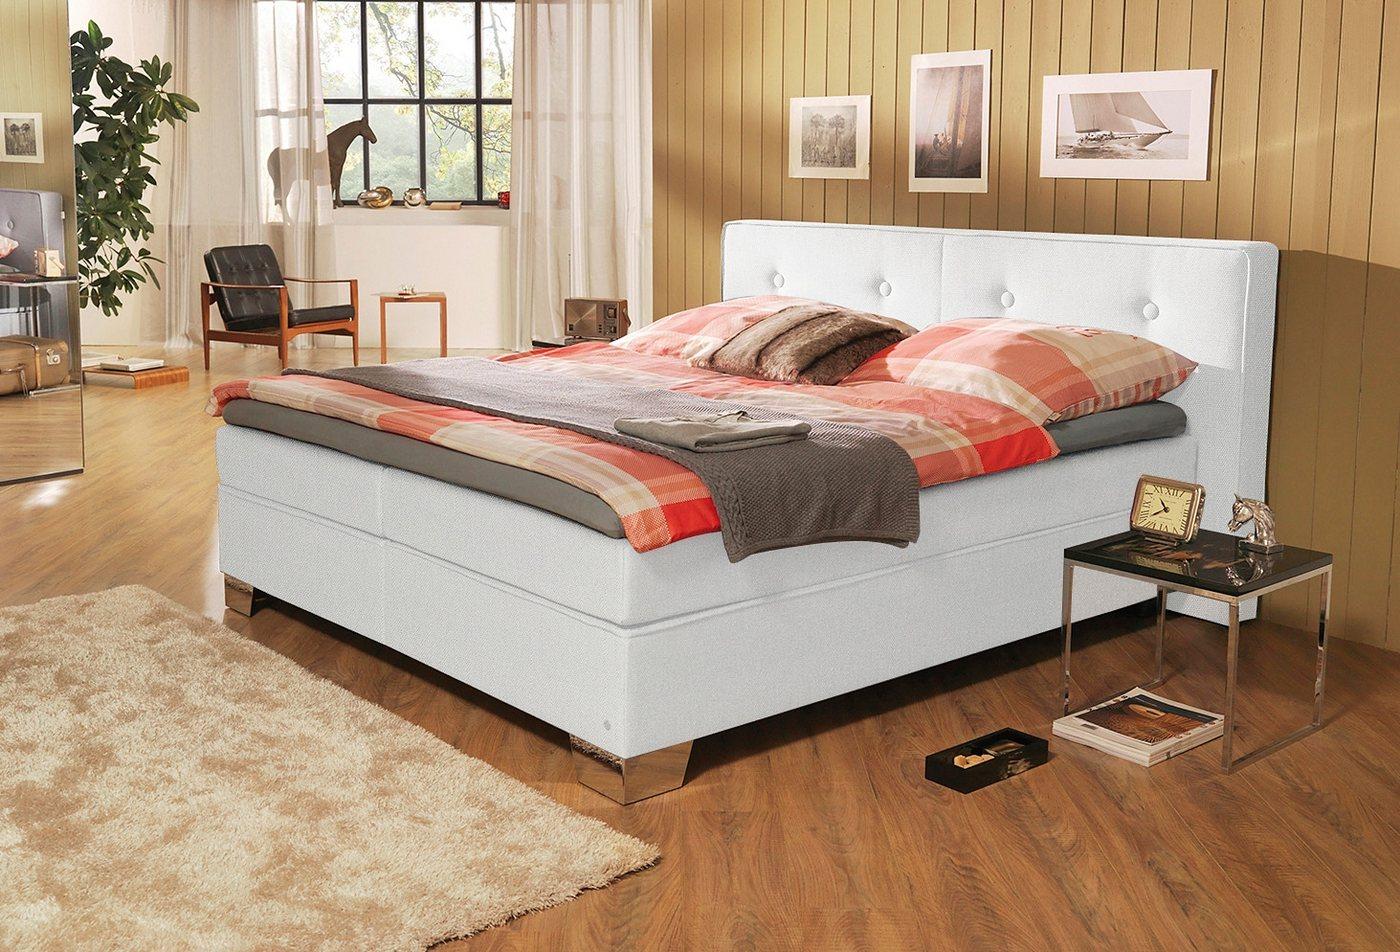 3 sparen tom tailor boxspringbett soft box nur cherry m bel otto. Black Bedroom Furniture Sets. Home Design Ideas